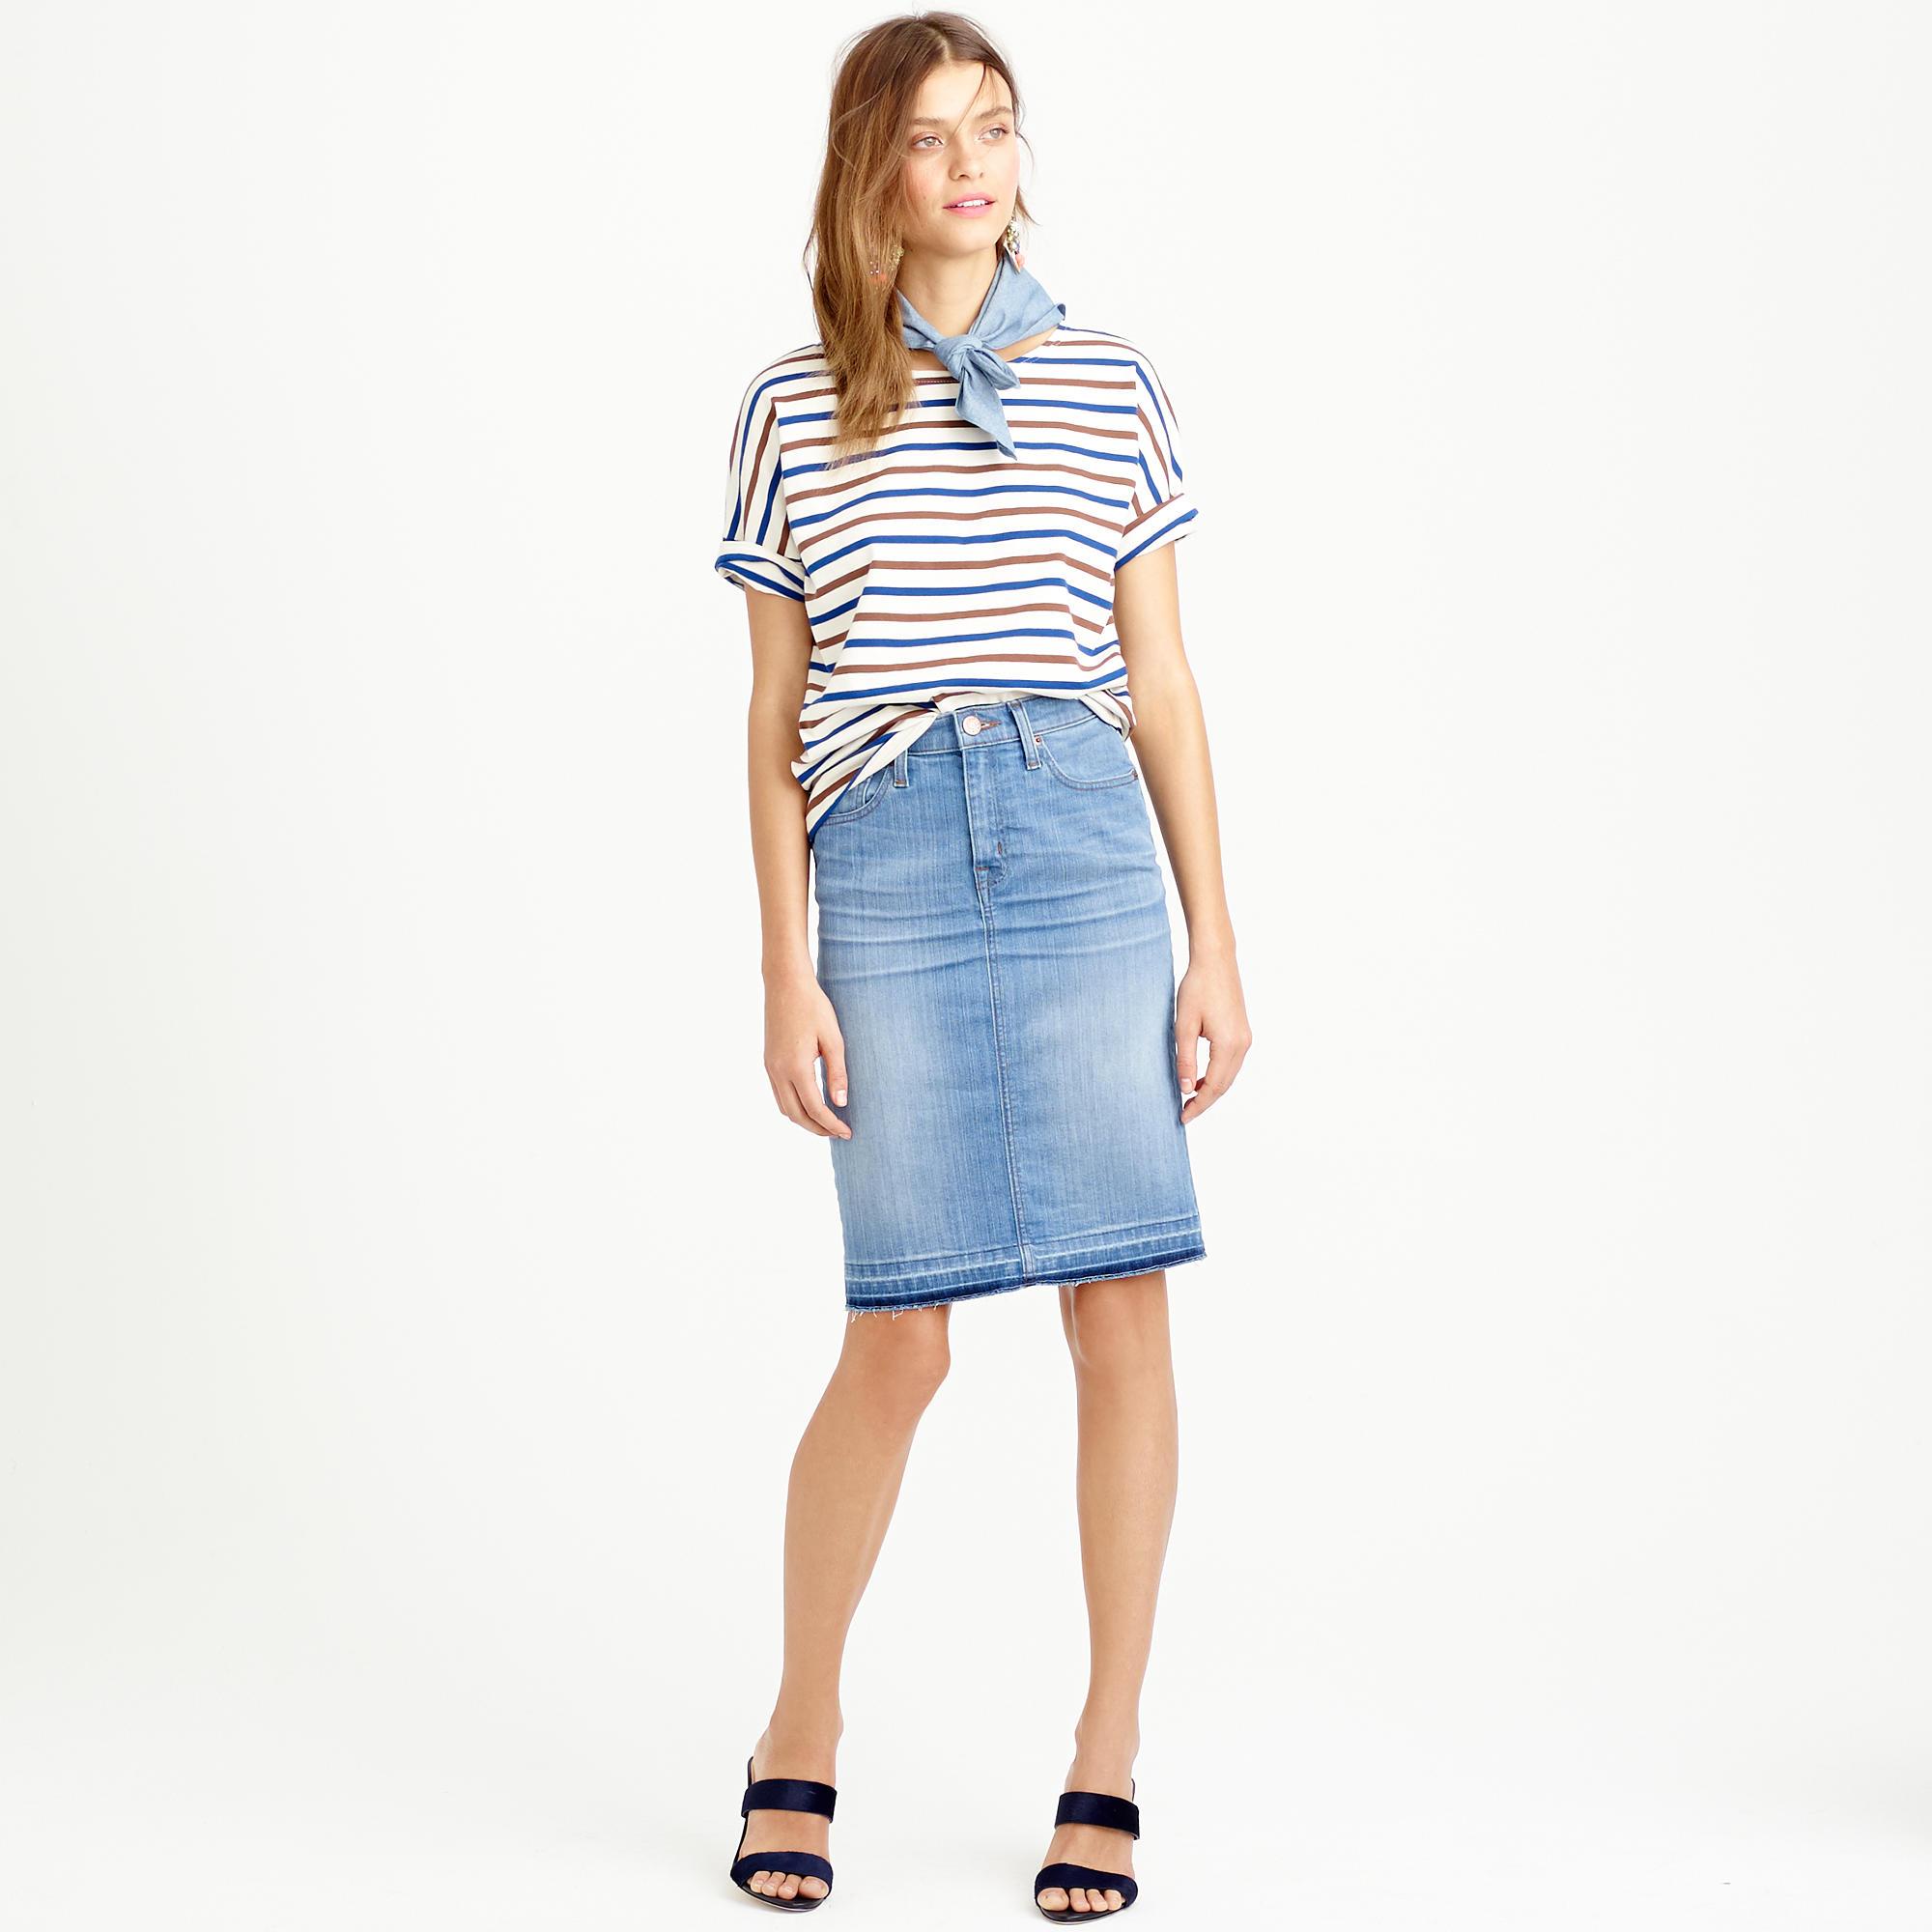 c530e99863 J.Crew Petite Frayed Denim Pencil Skirt in Blue - Lyst